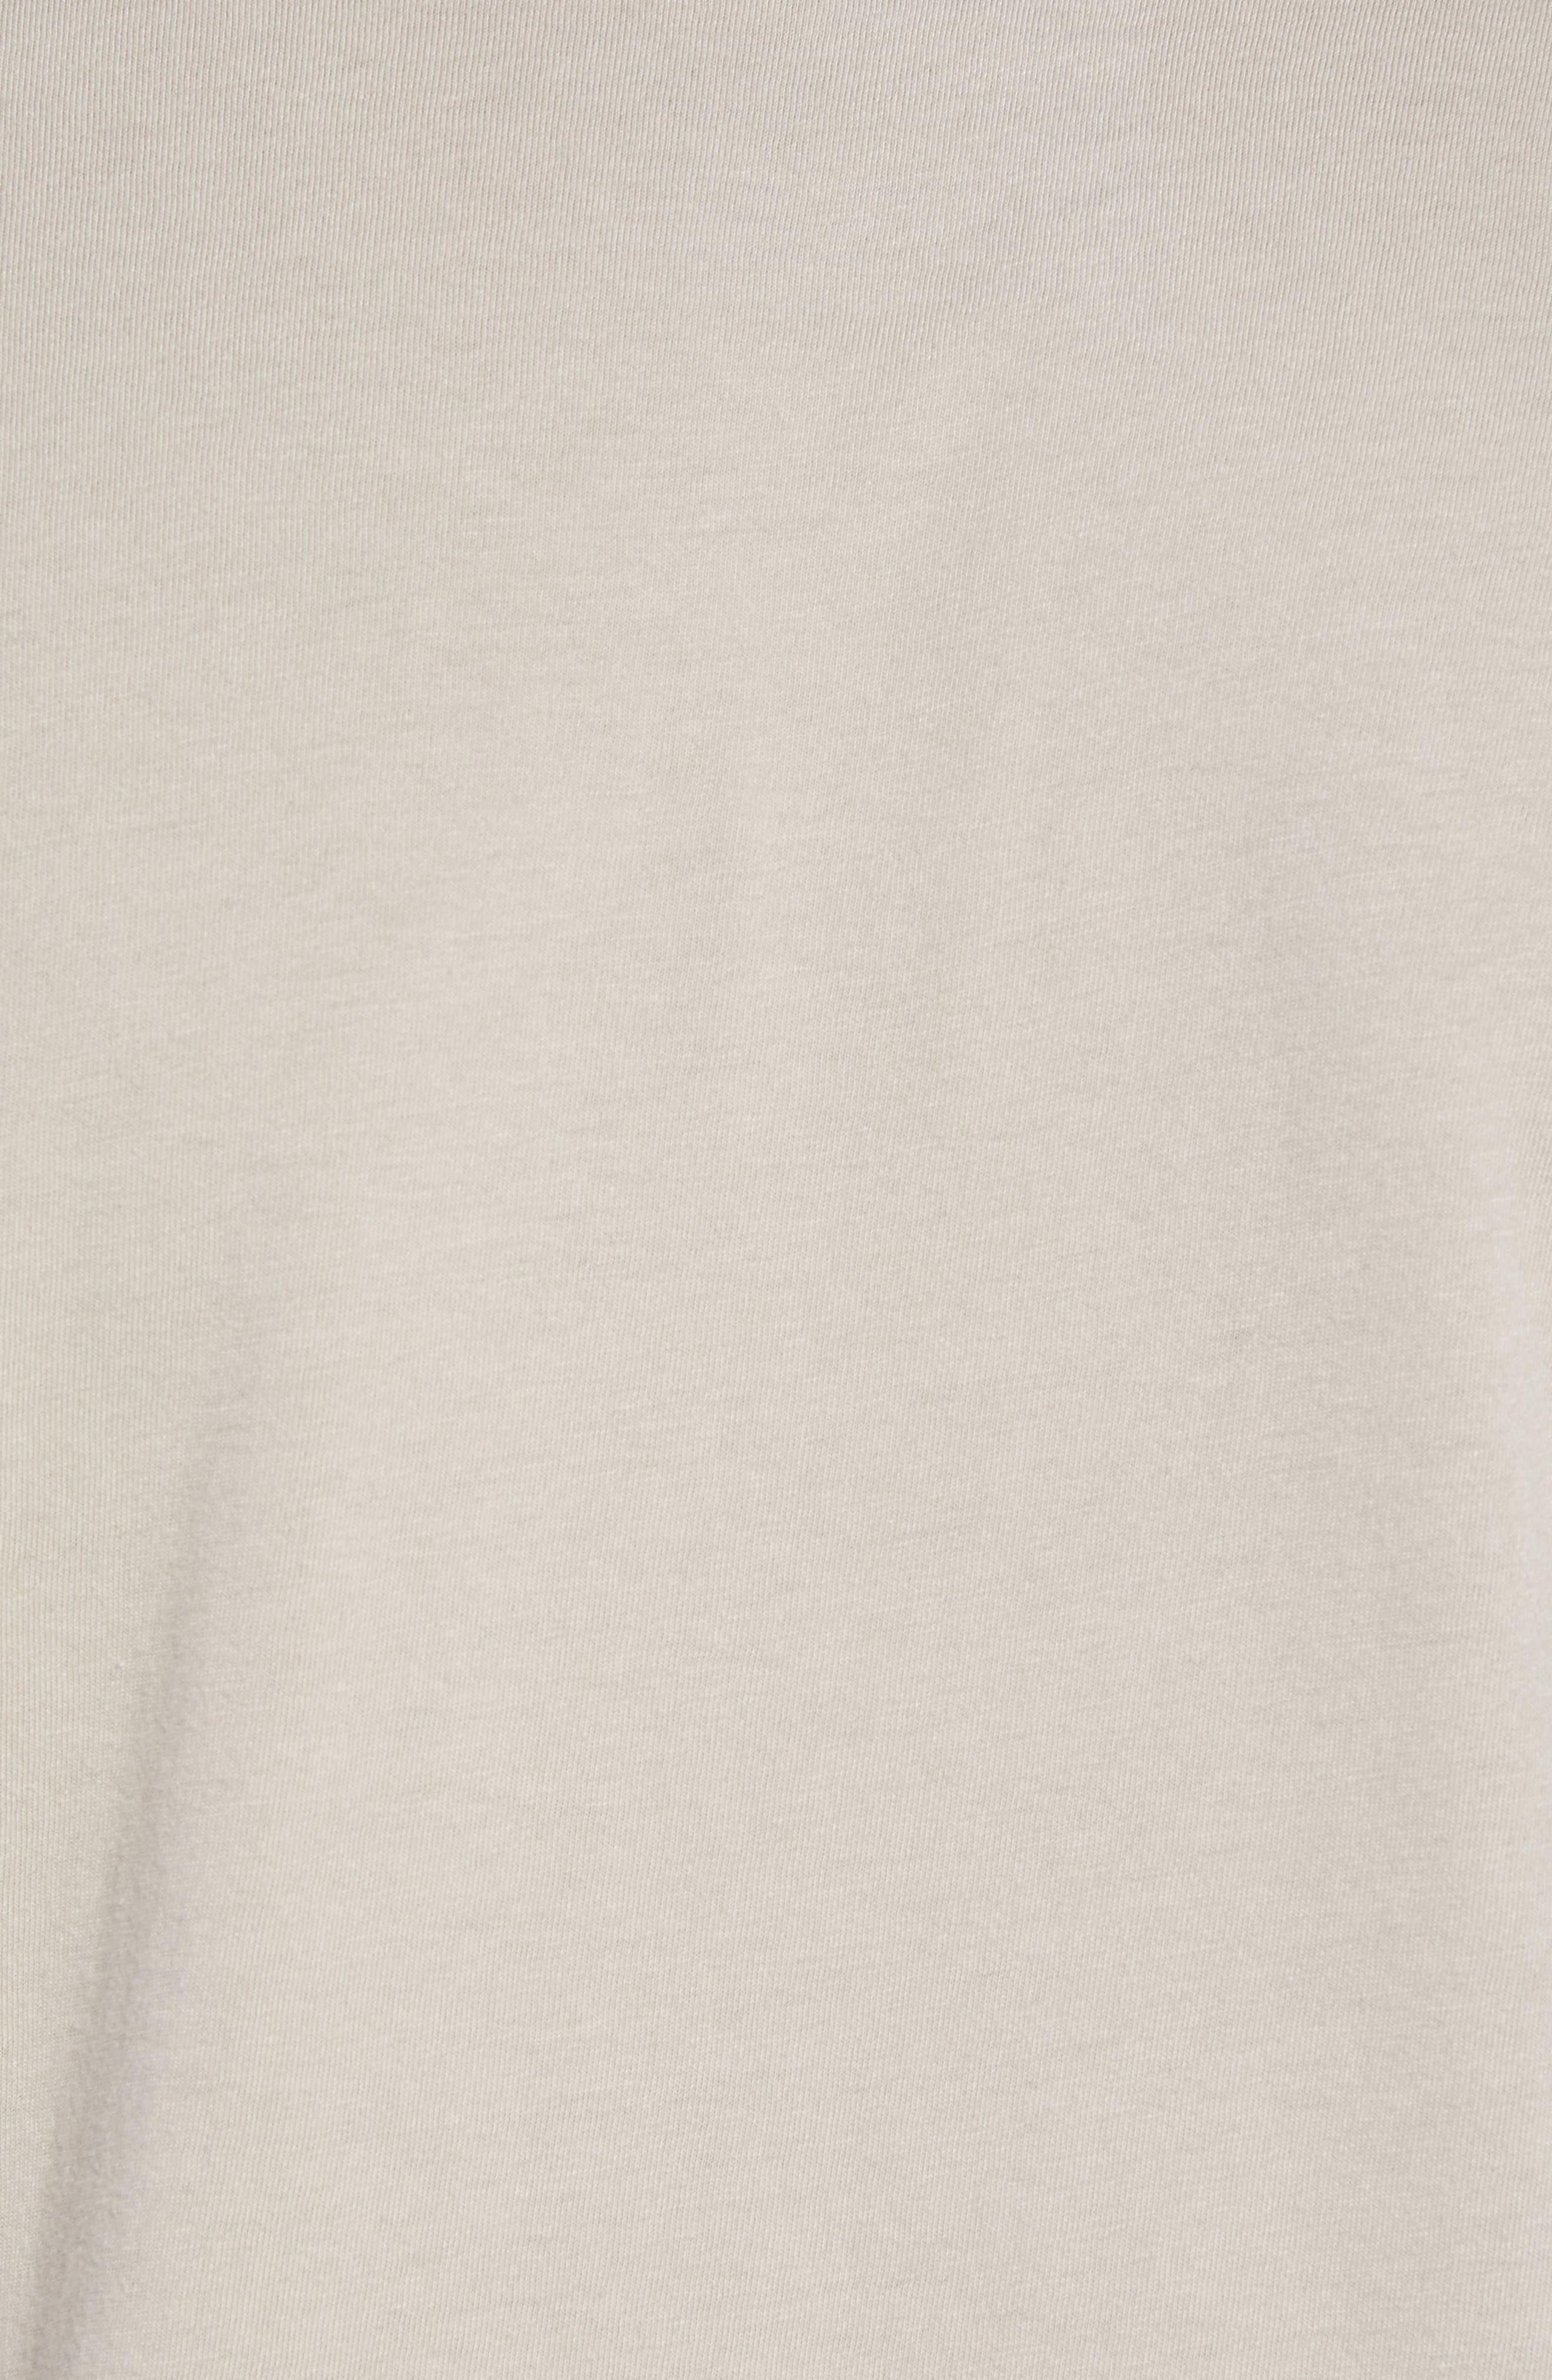 Tri-Splice T-Shirt,                             Alternate thumbnail 5, color,                             Beige Navy Sun Splice